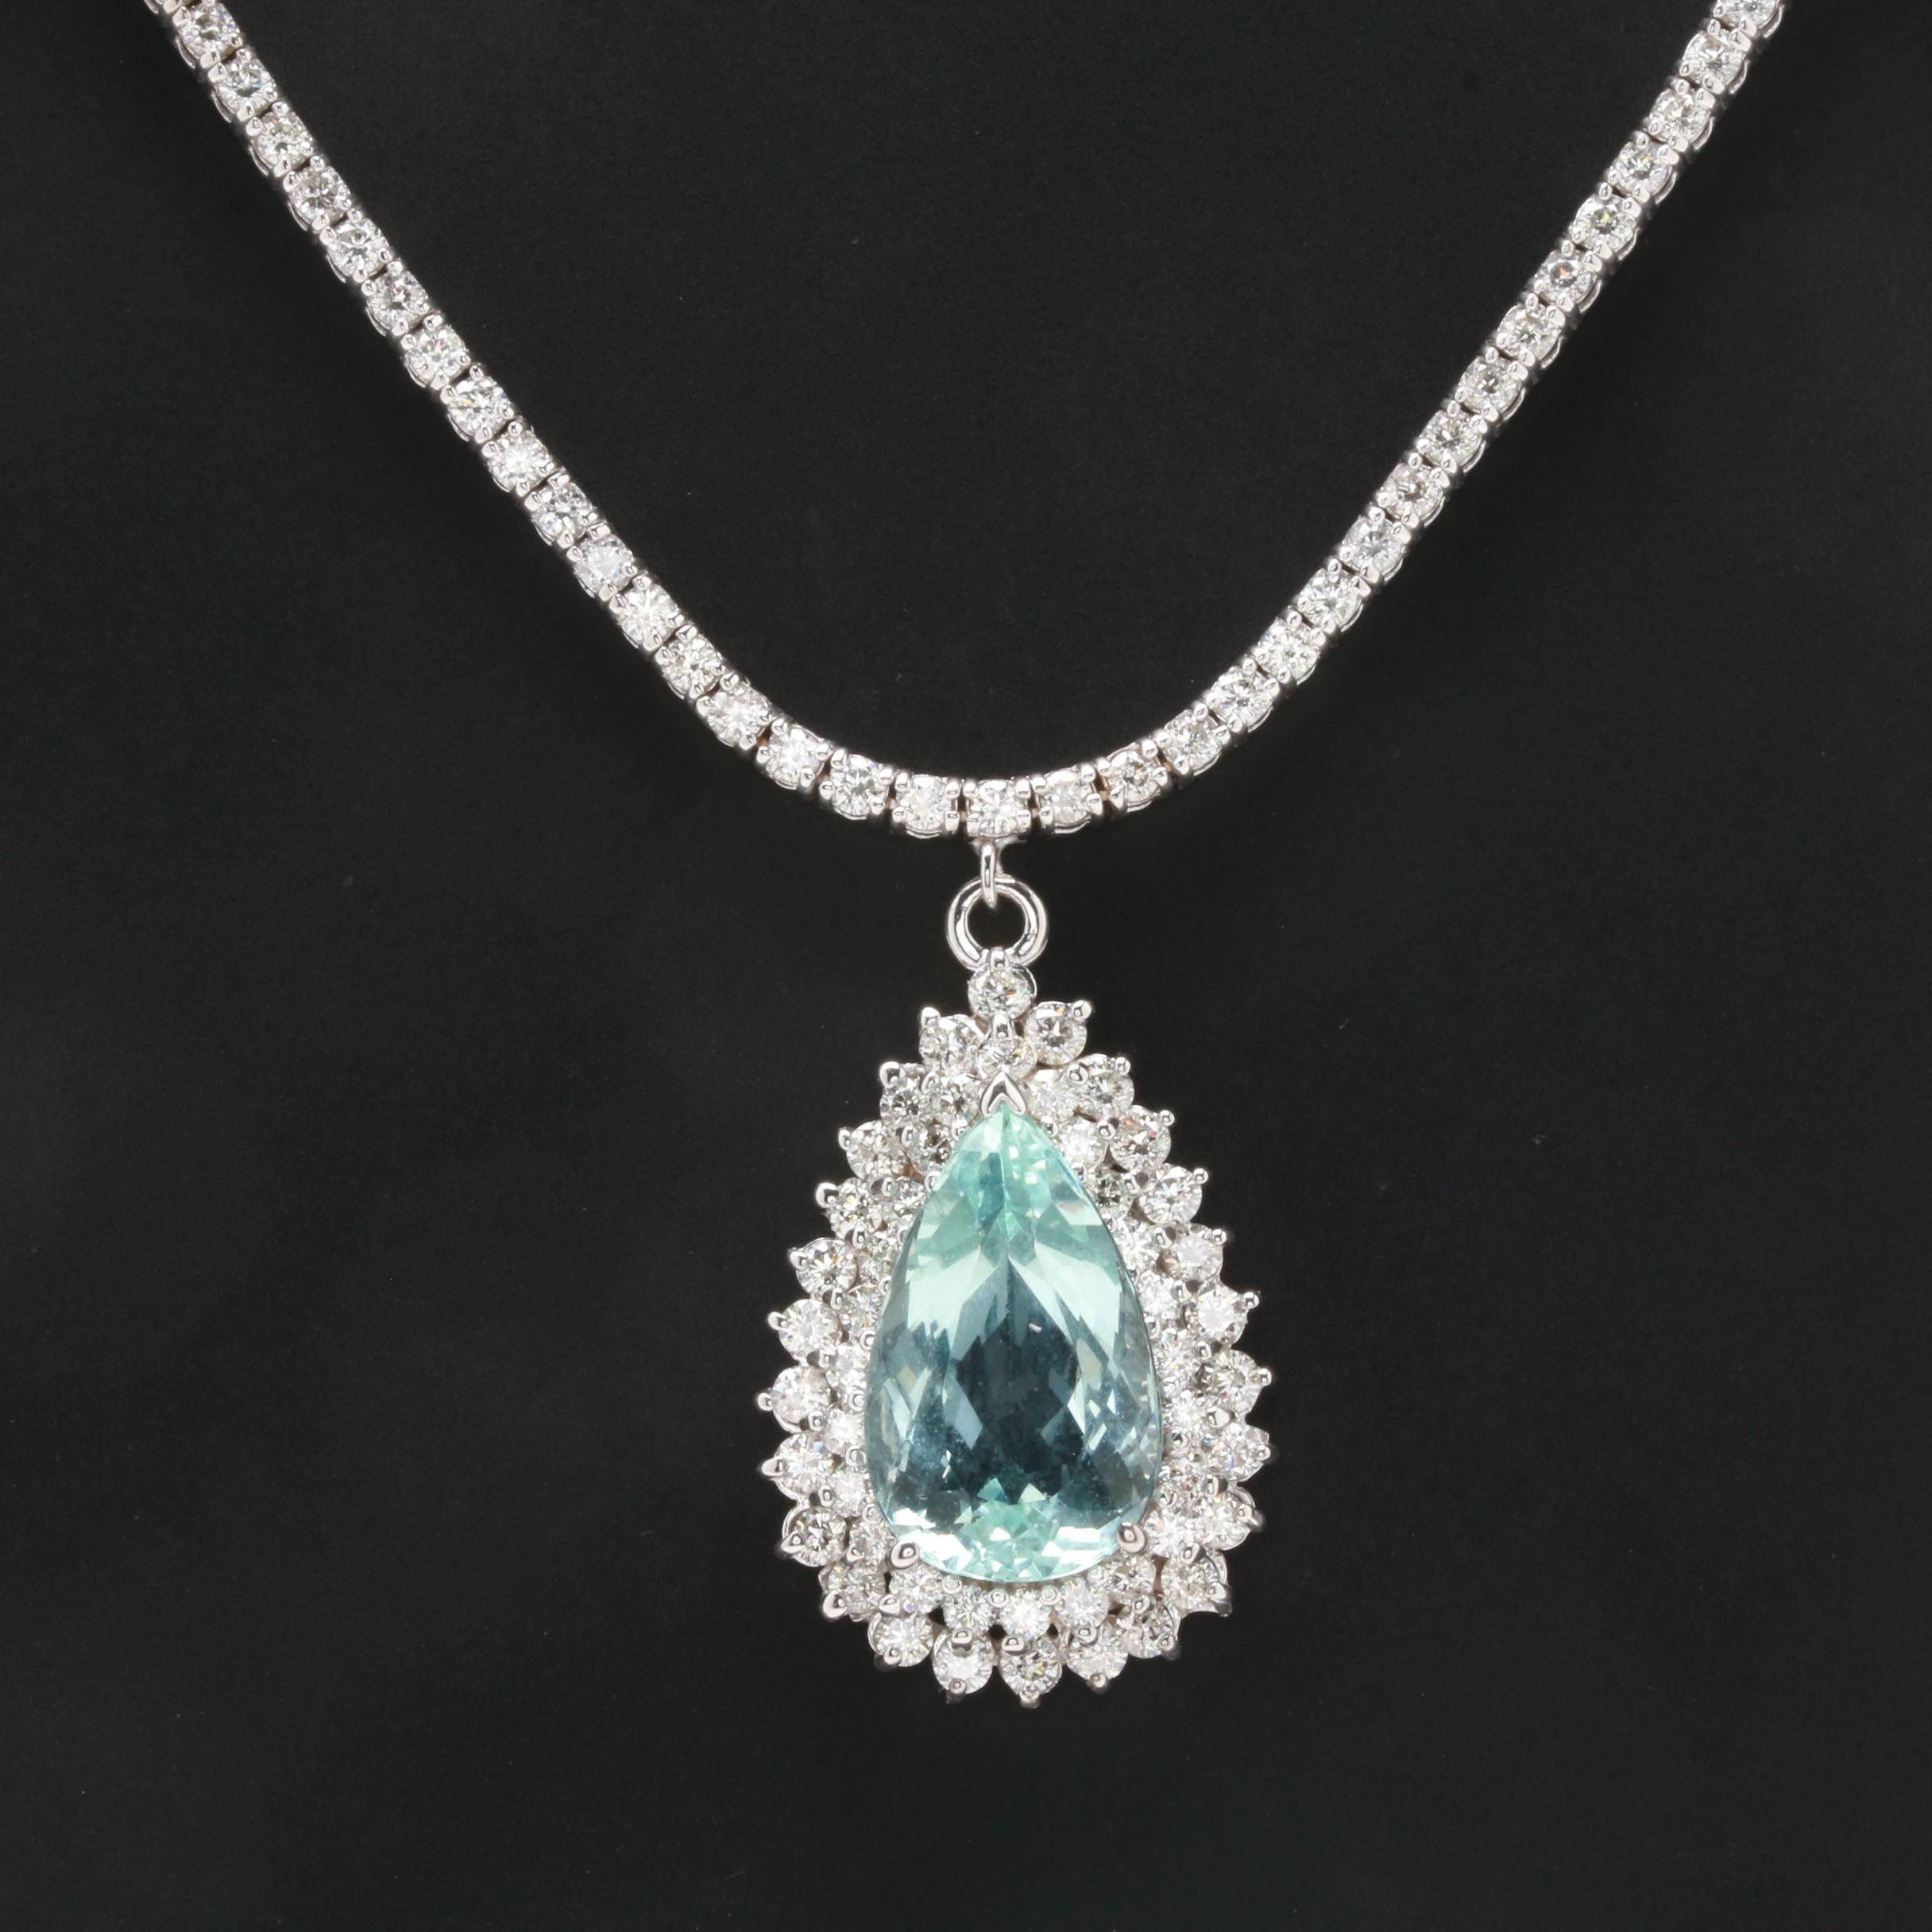 14K and 18K White Gold 6.15 CT Aquamarine and 4.28 CTW Diamond Pendant Necklace